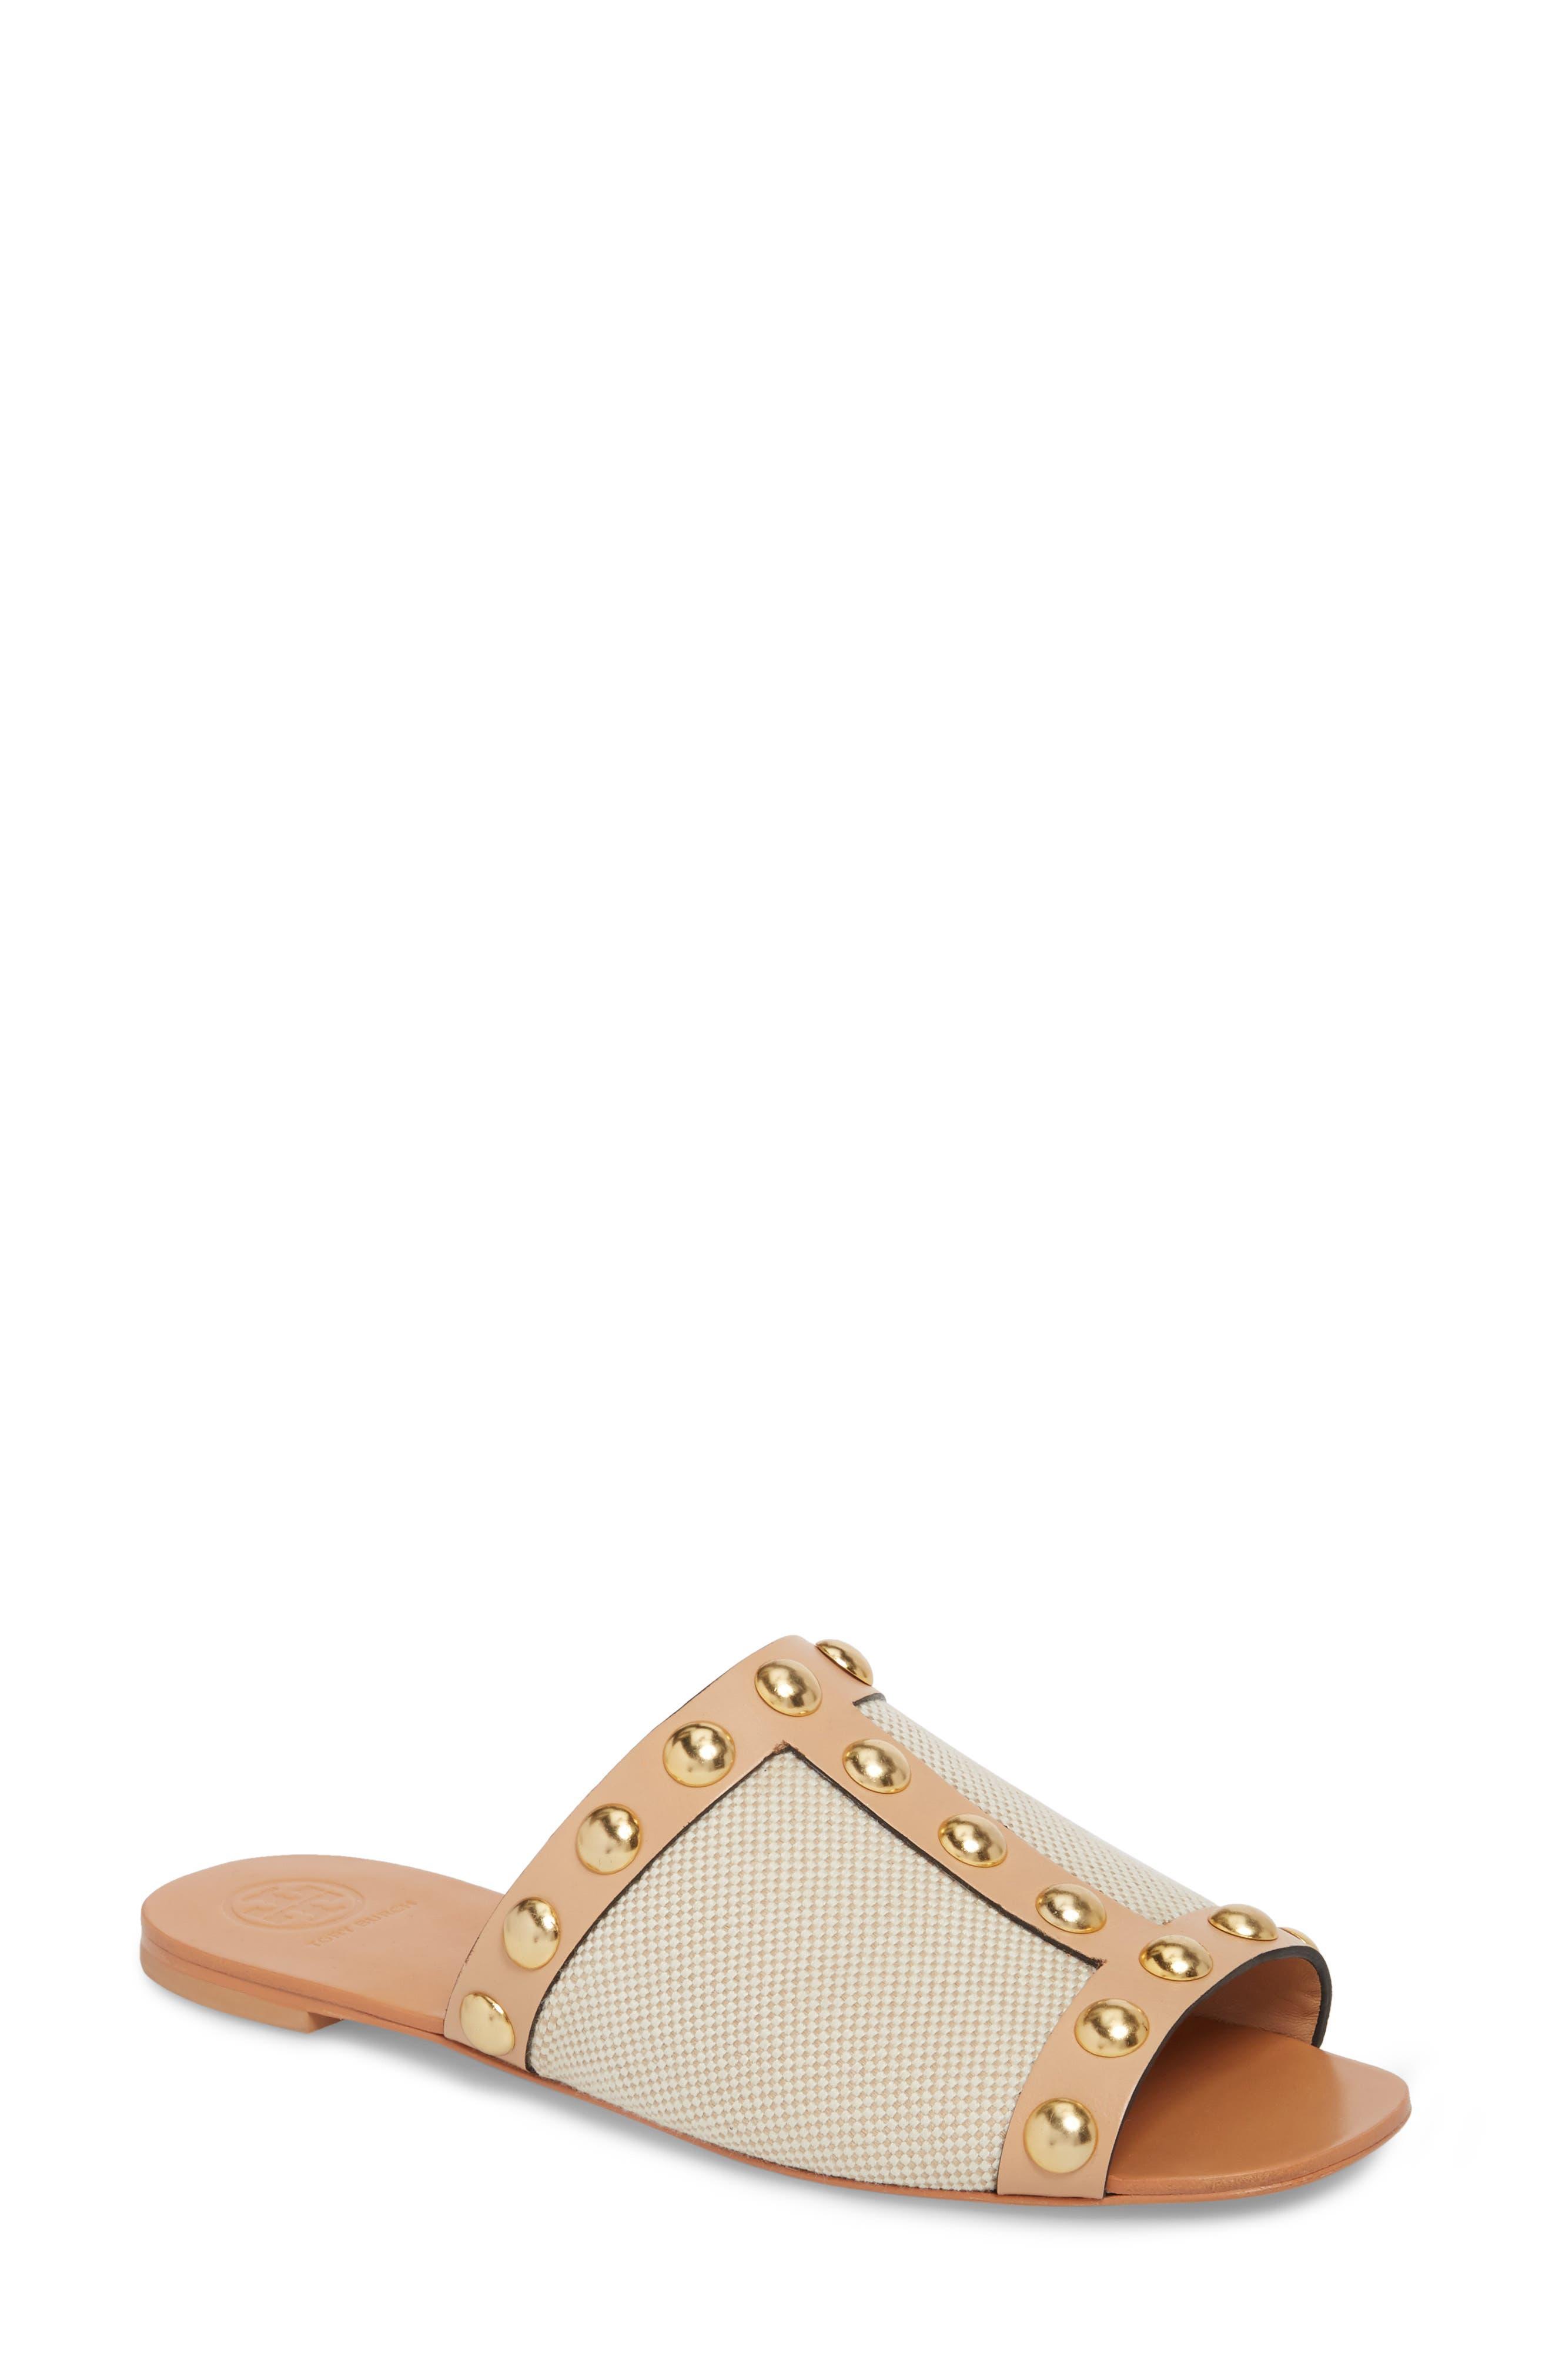 Blythe Slide Sandal,                             Main thumbnail 1, color,                             250